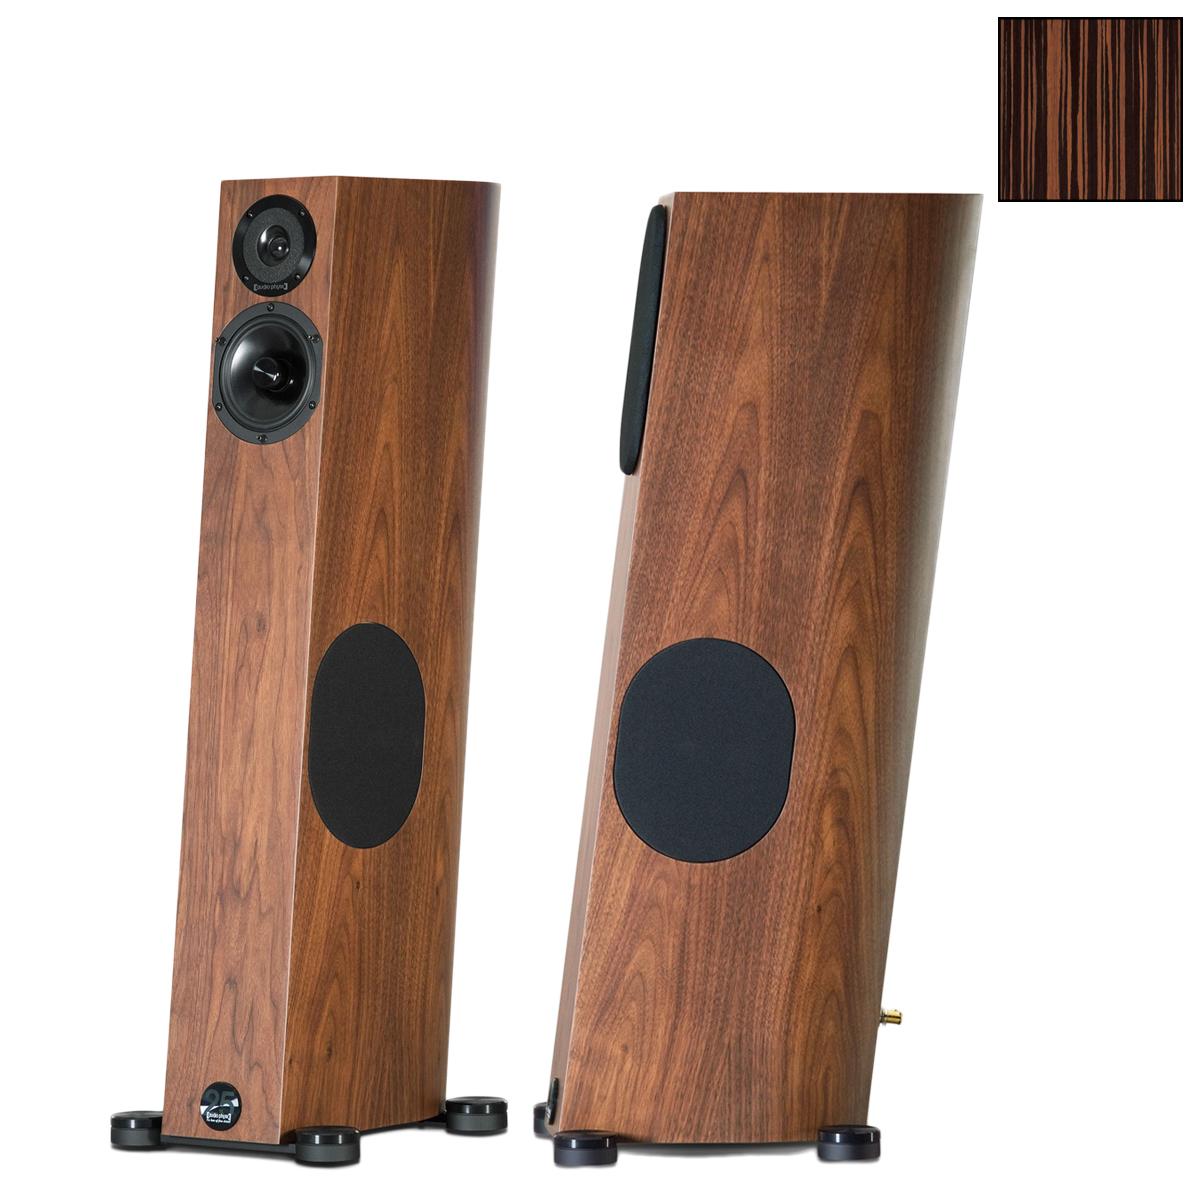 Напольная акустика Audio Physic Tempo 25 (Macassar Ebony) акустика центрального канала piega classic center large macassar high gloss